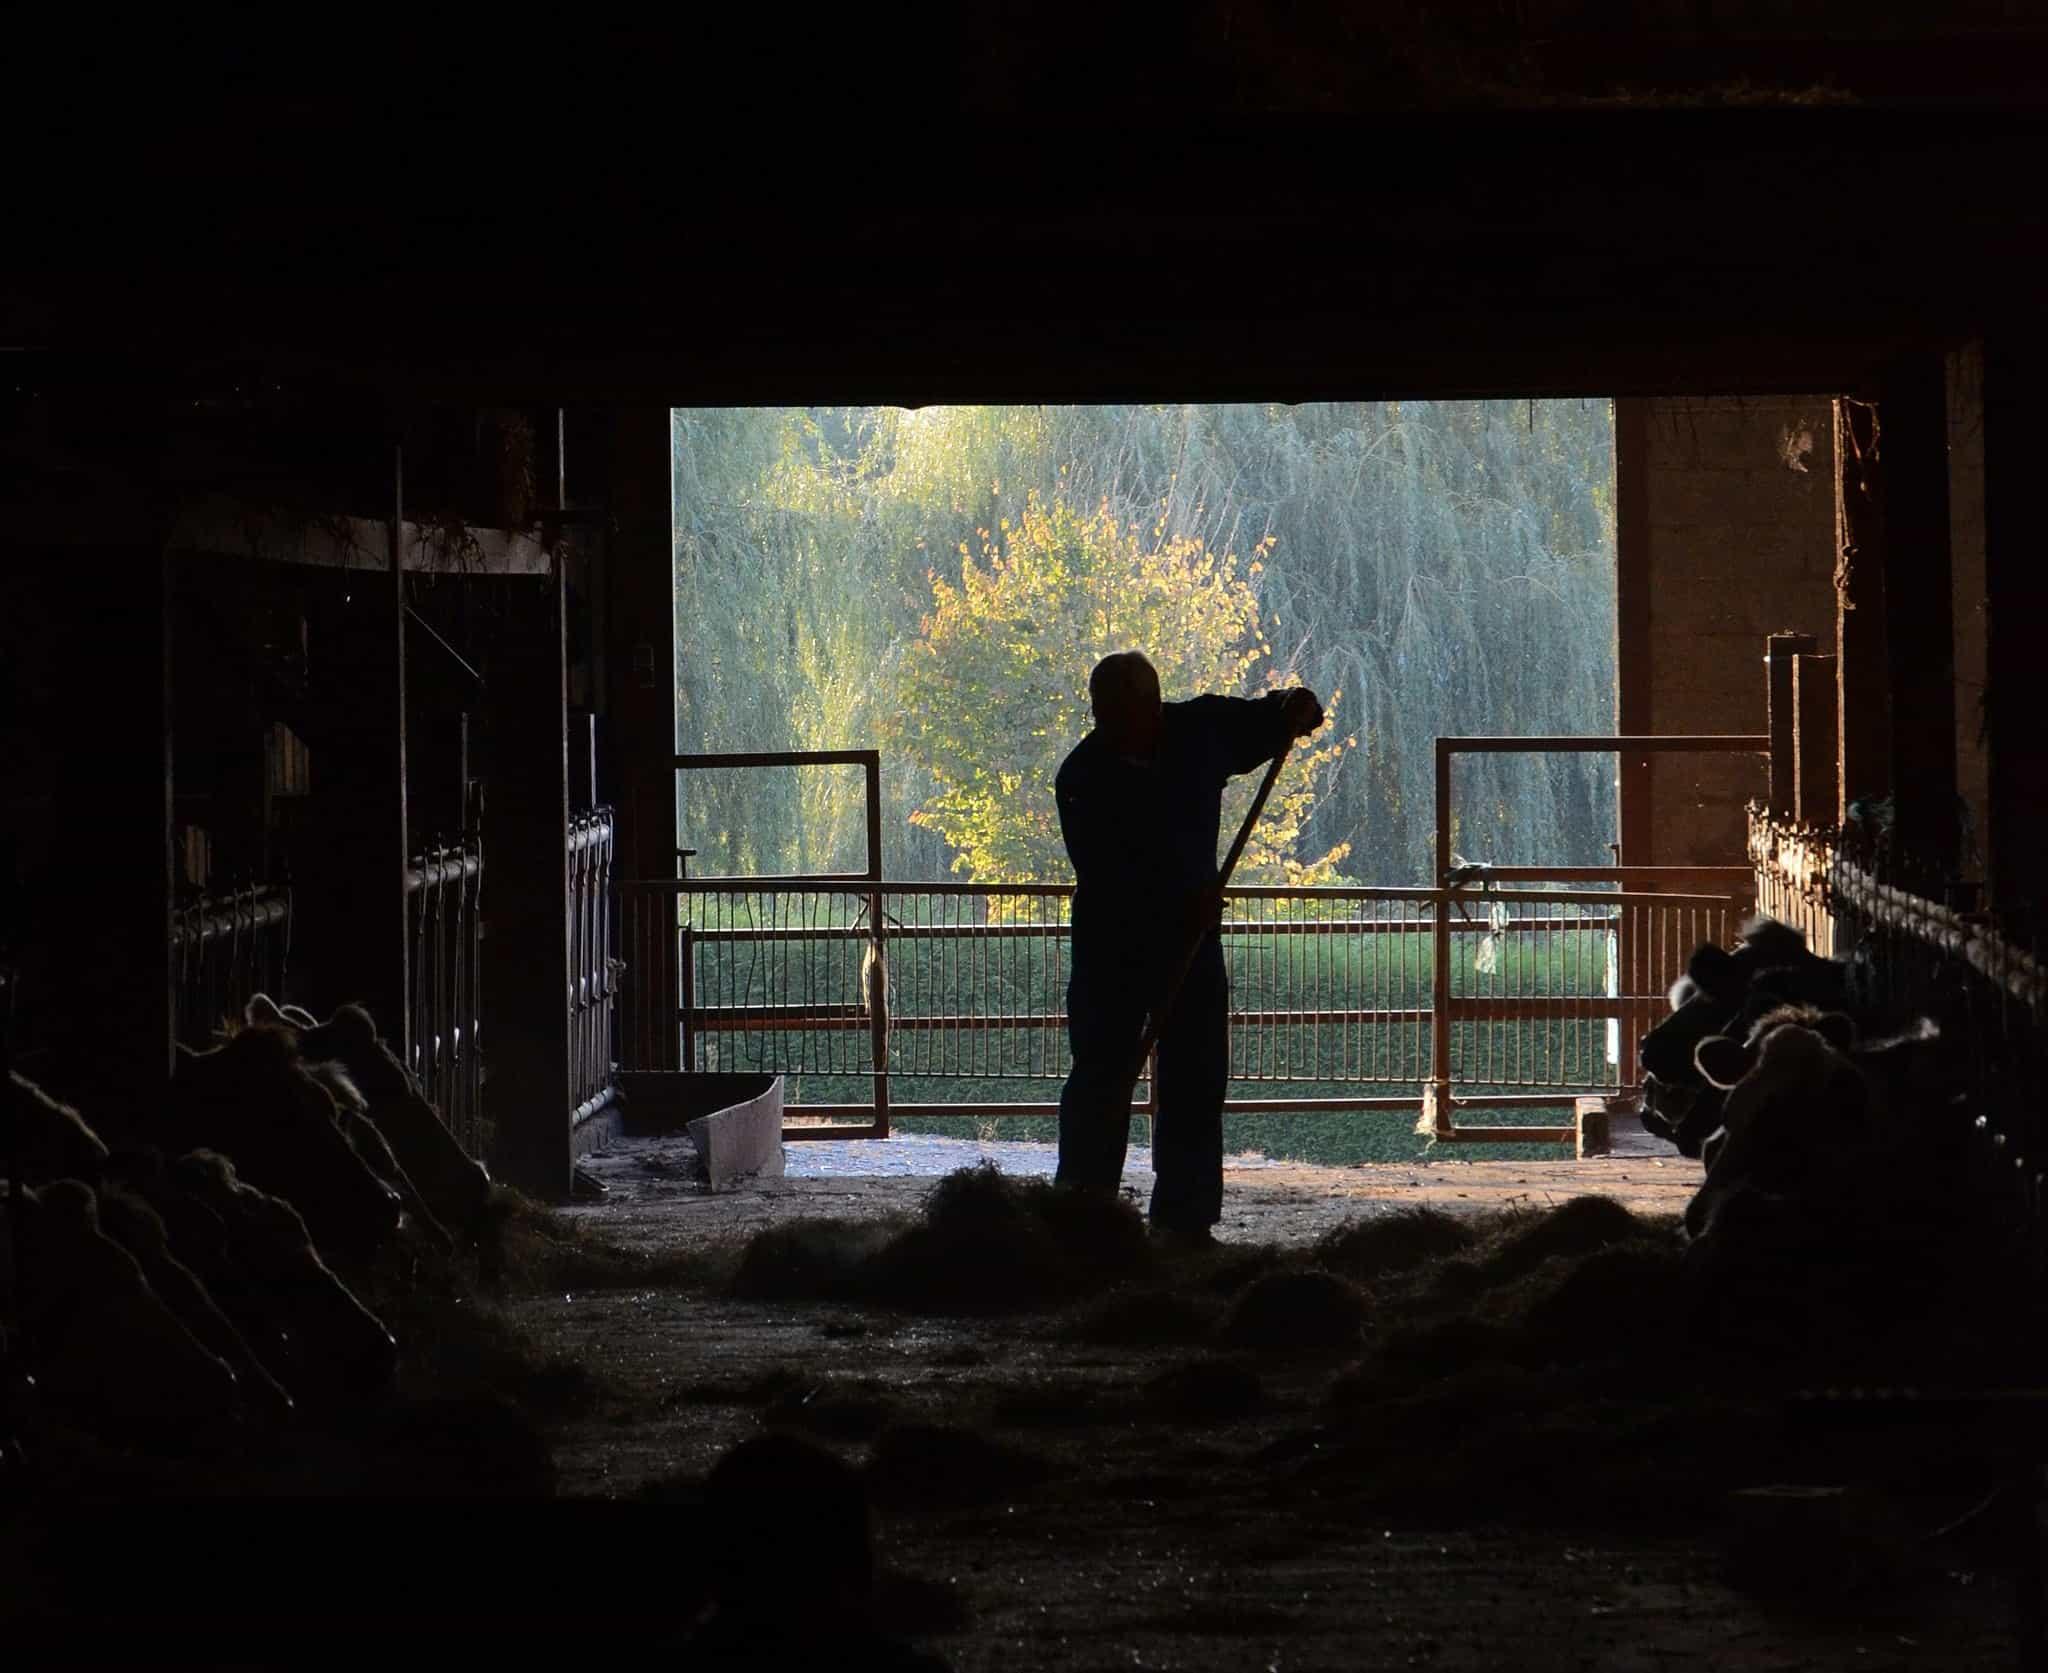 's_silhouette,_feeding_cattle